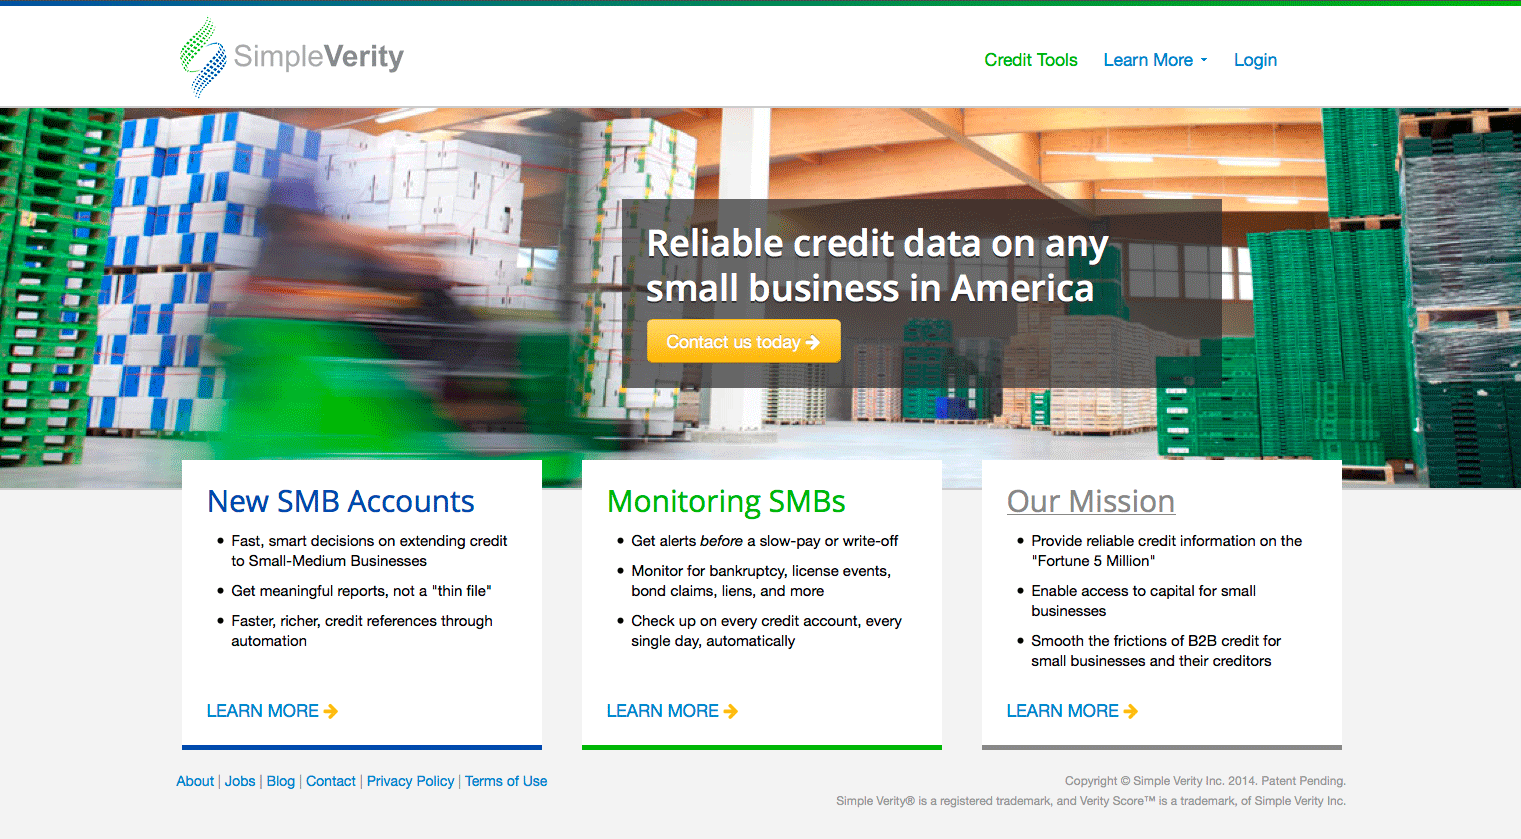 Seattle Web Development Design And Seo Services